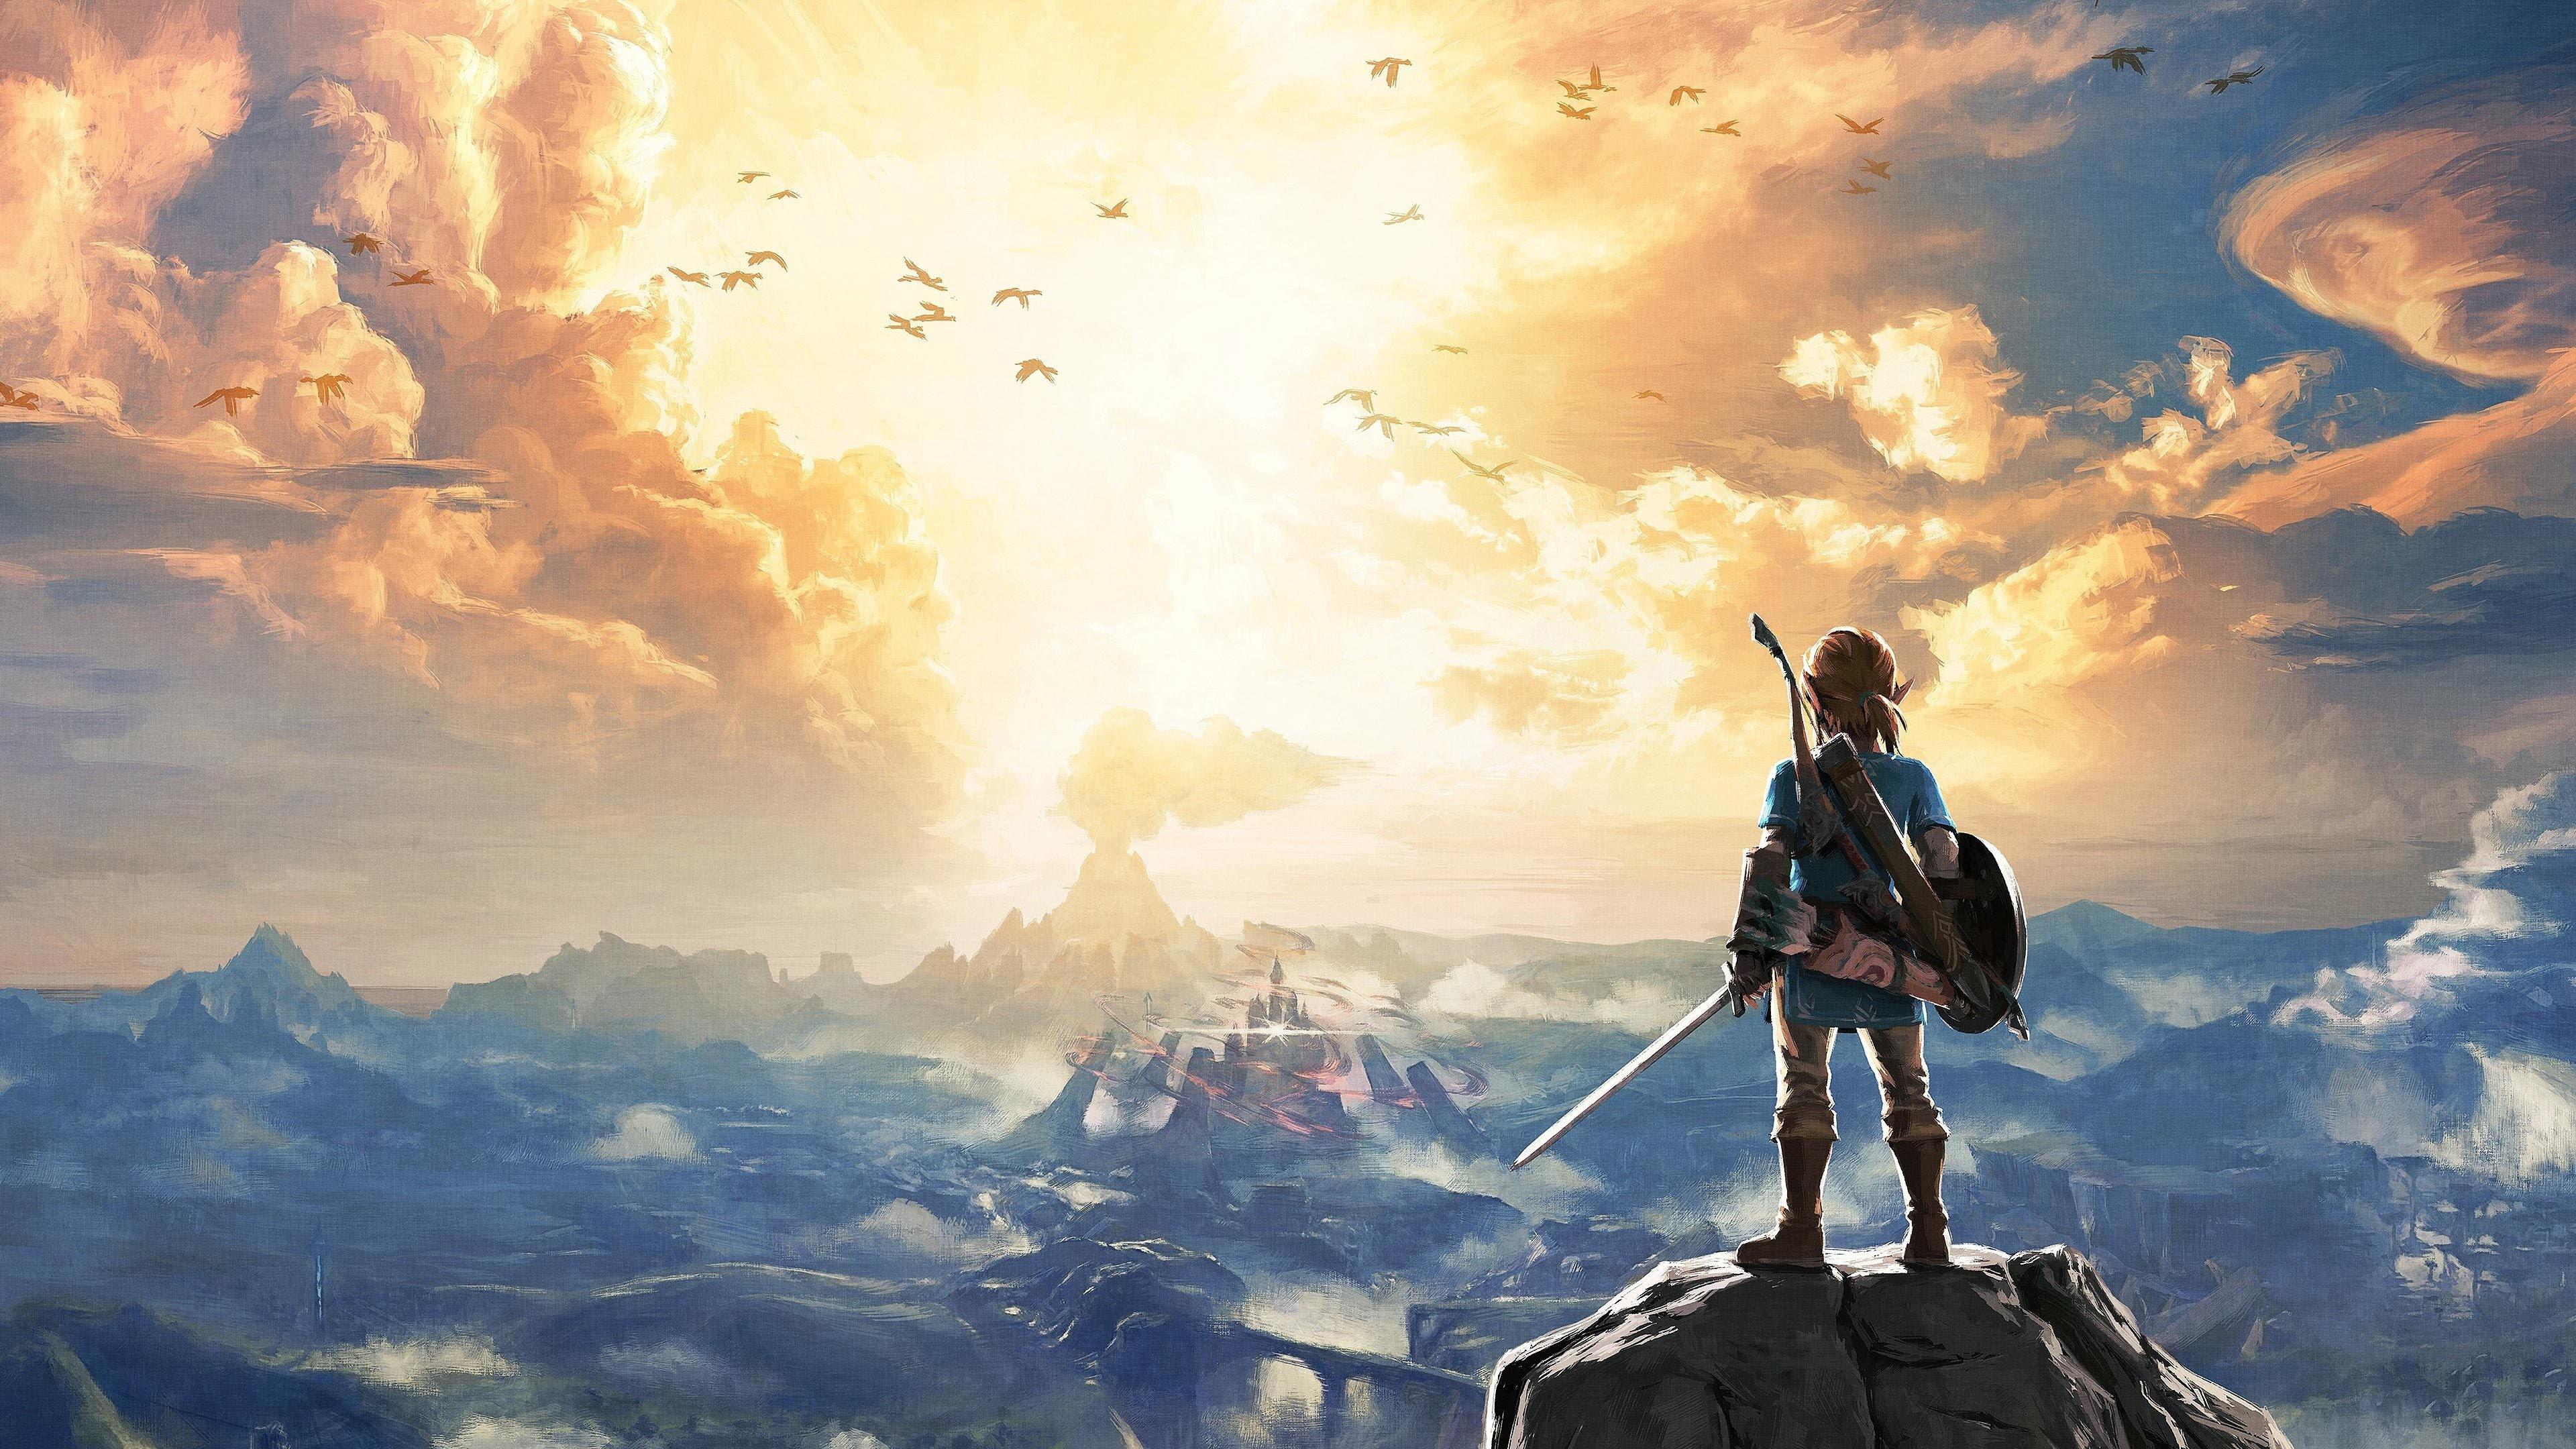 The Legend of Zelda Wallpaper 79  images